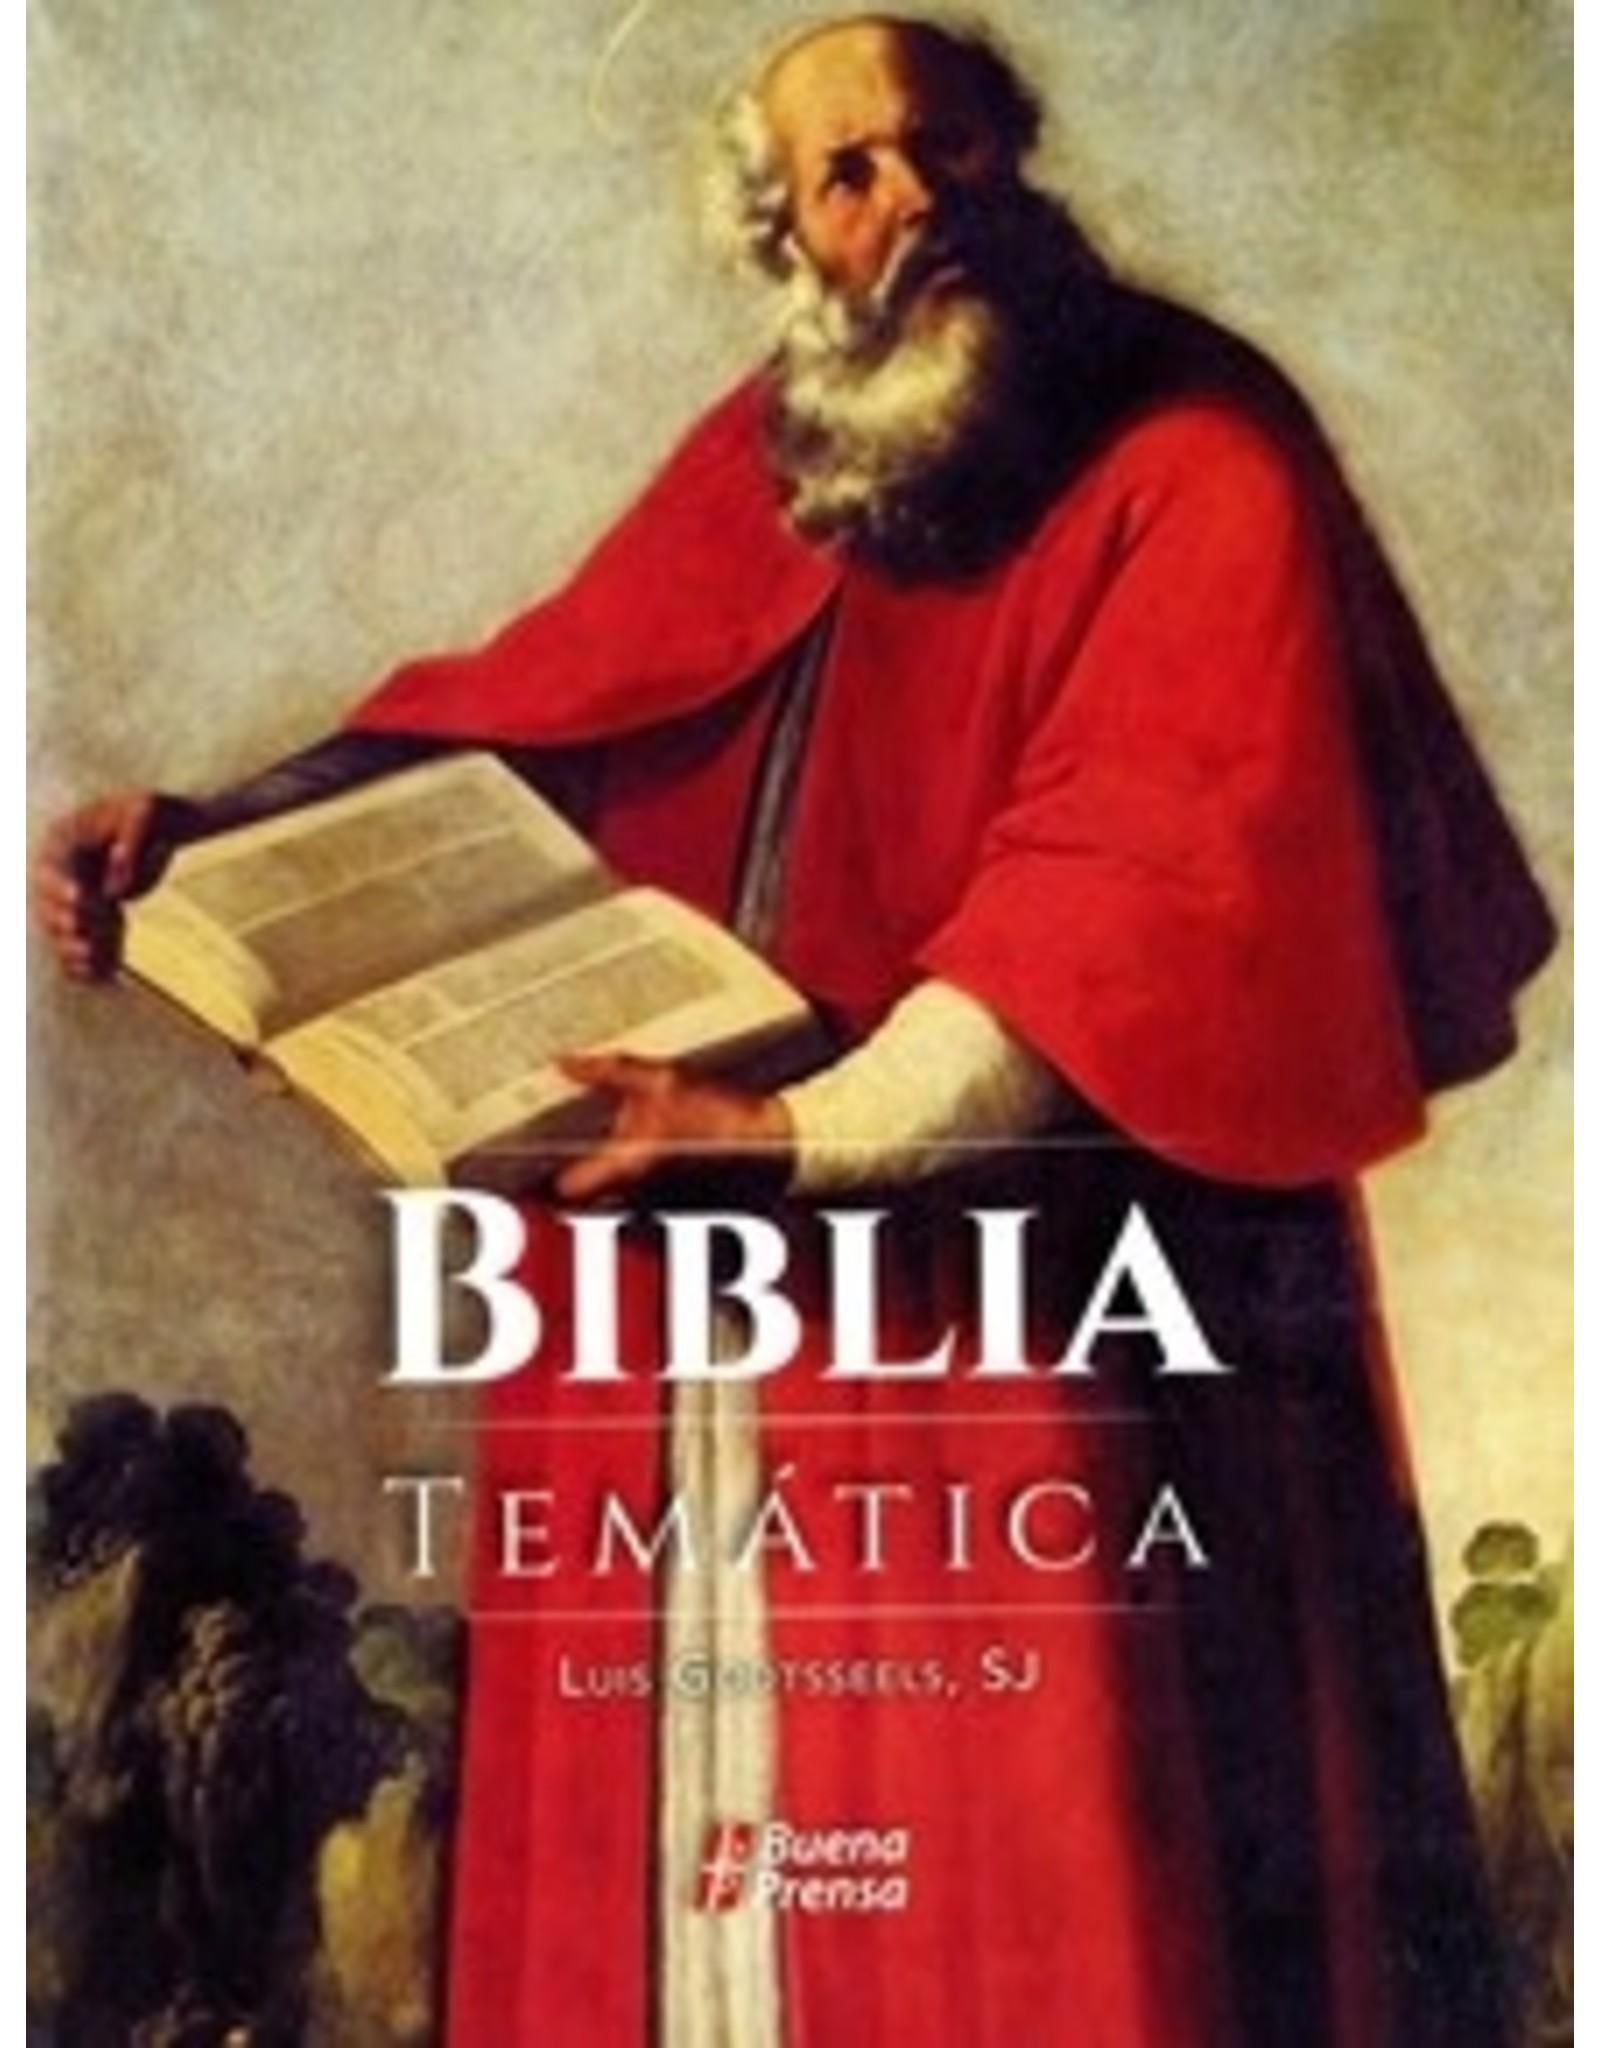 Biblia Temática